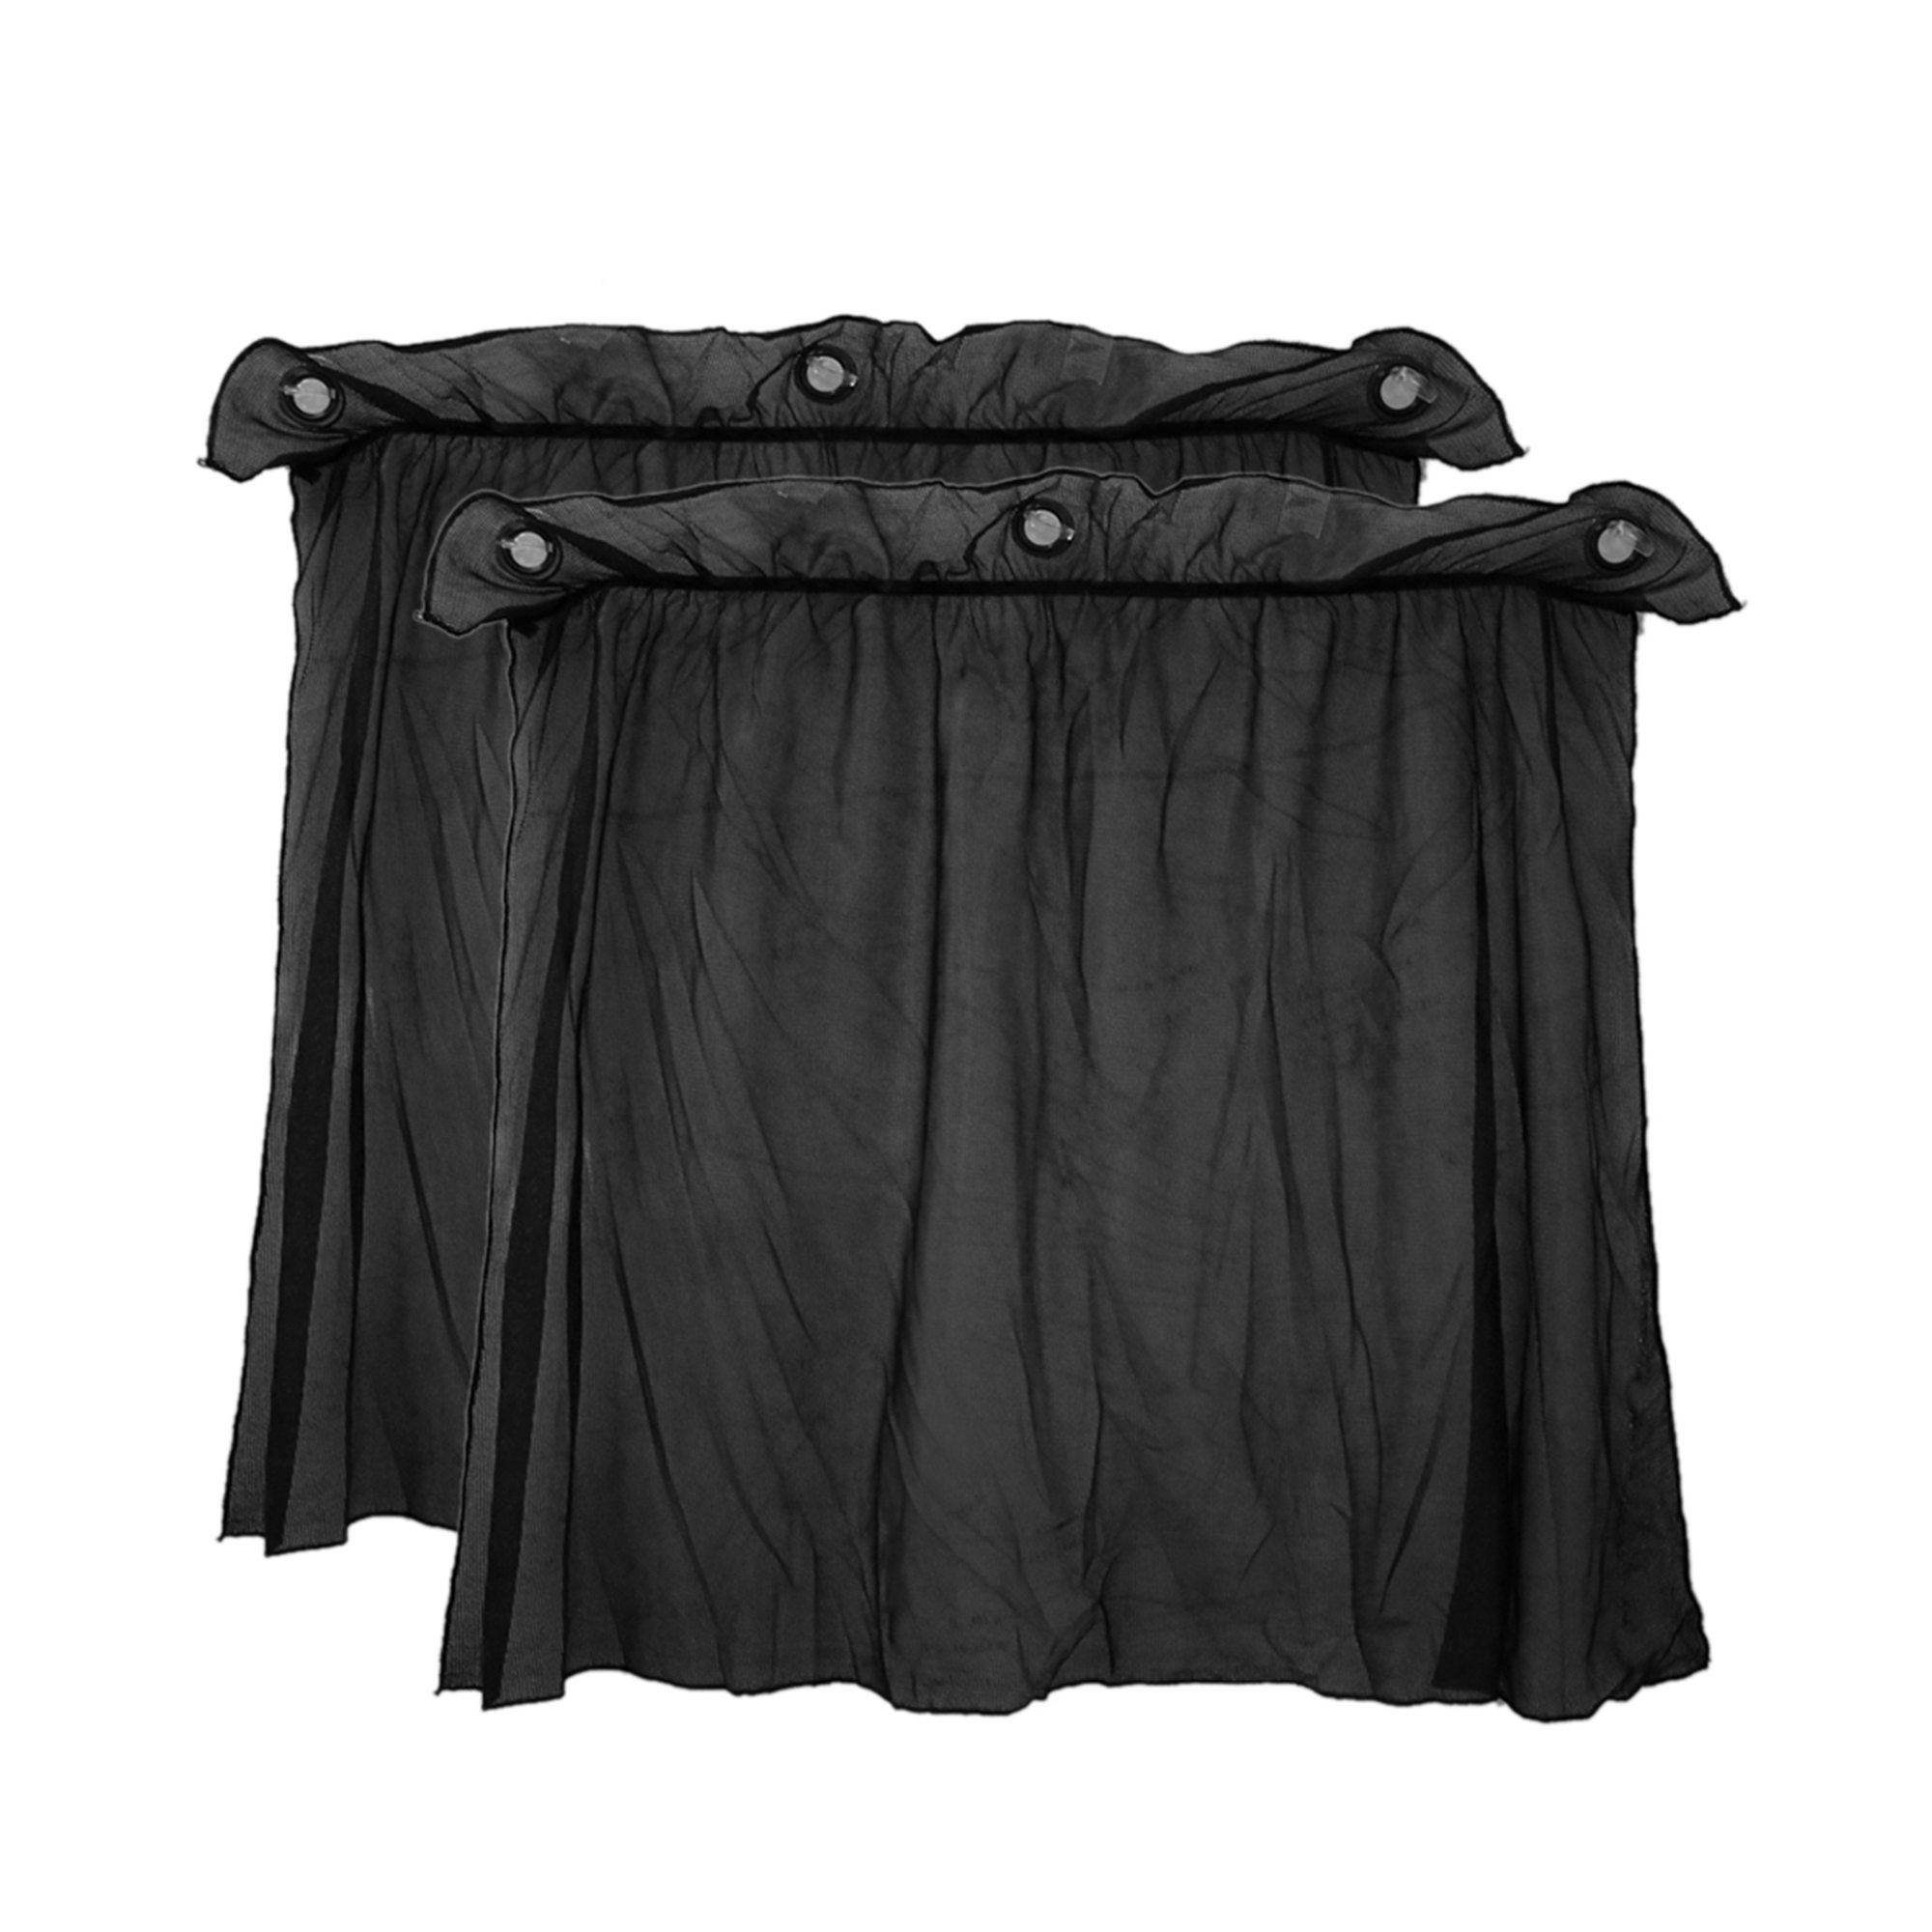 2 Pcs 70 x 52cm Car Side Window SunShade Nylon Mesh Curtain UV Protection